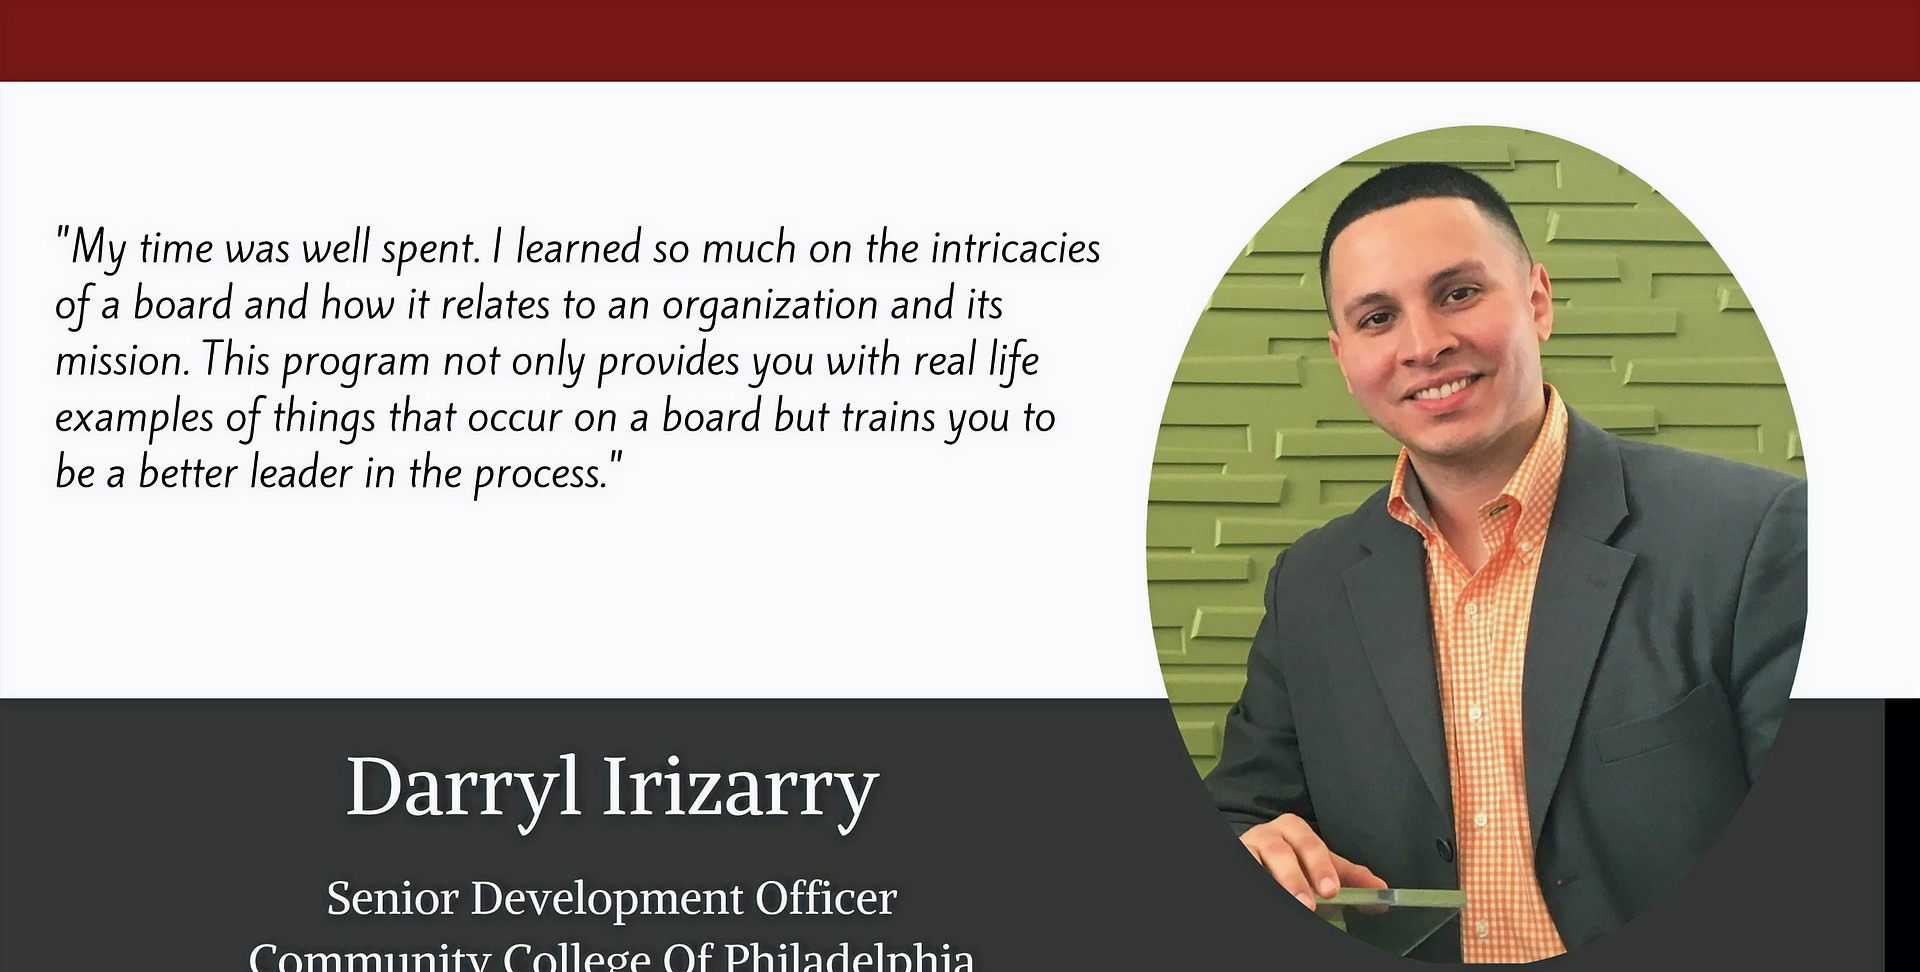 Darryl Irizarry